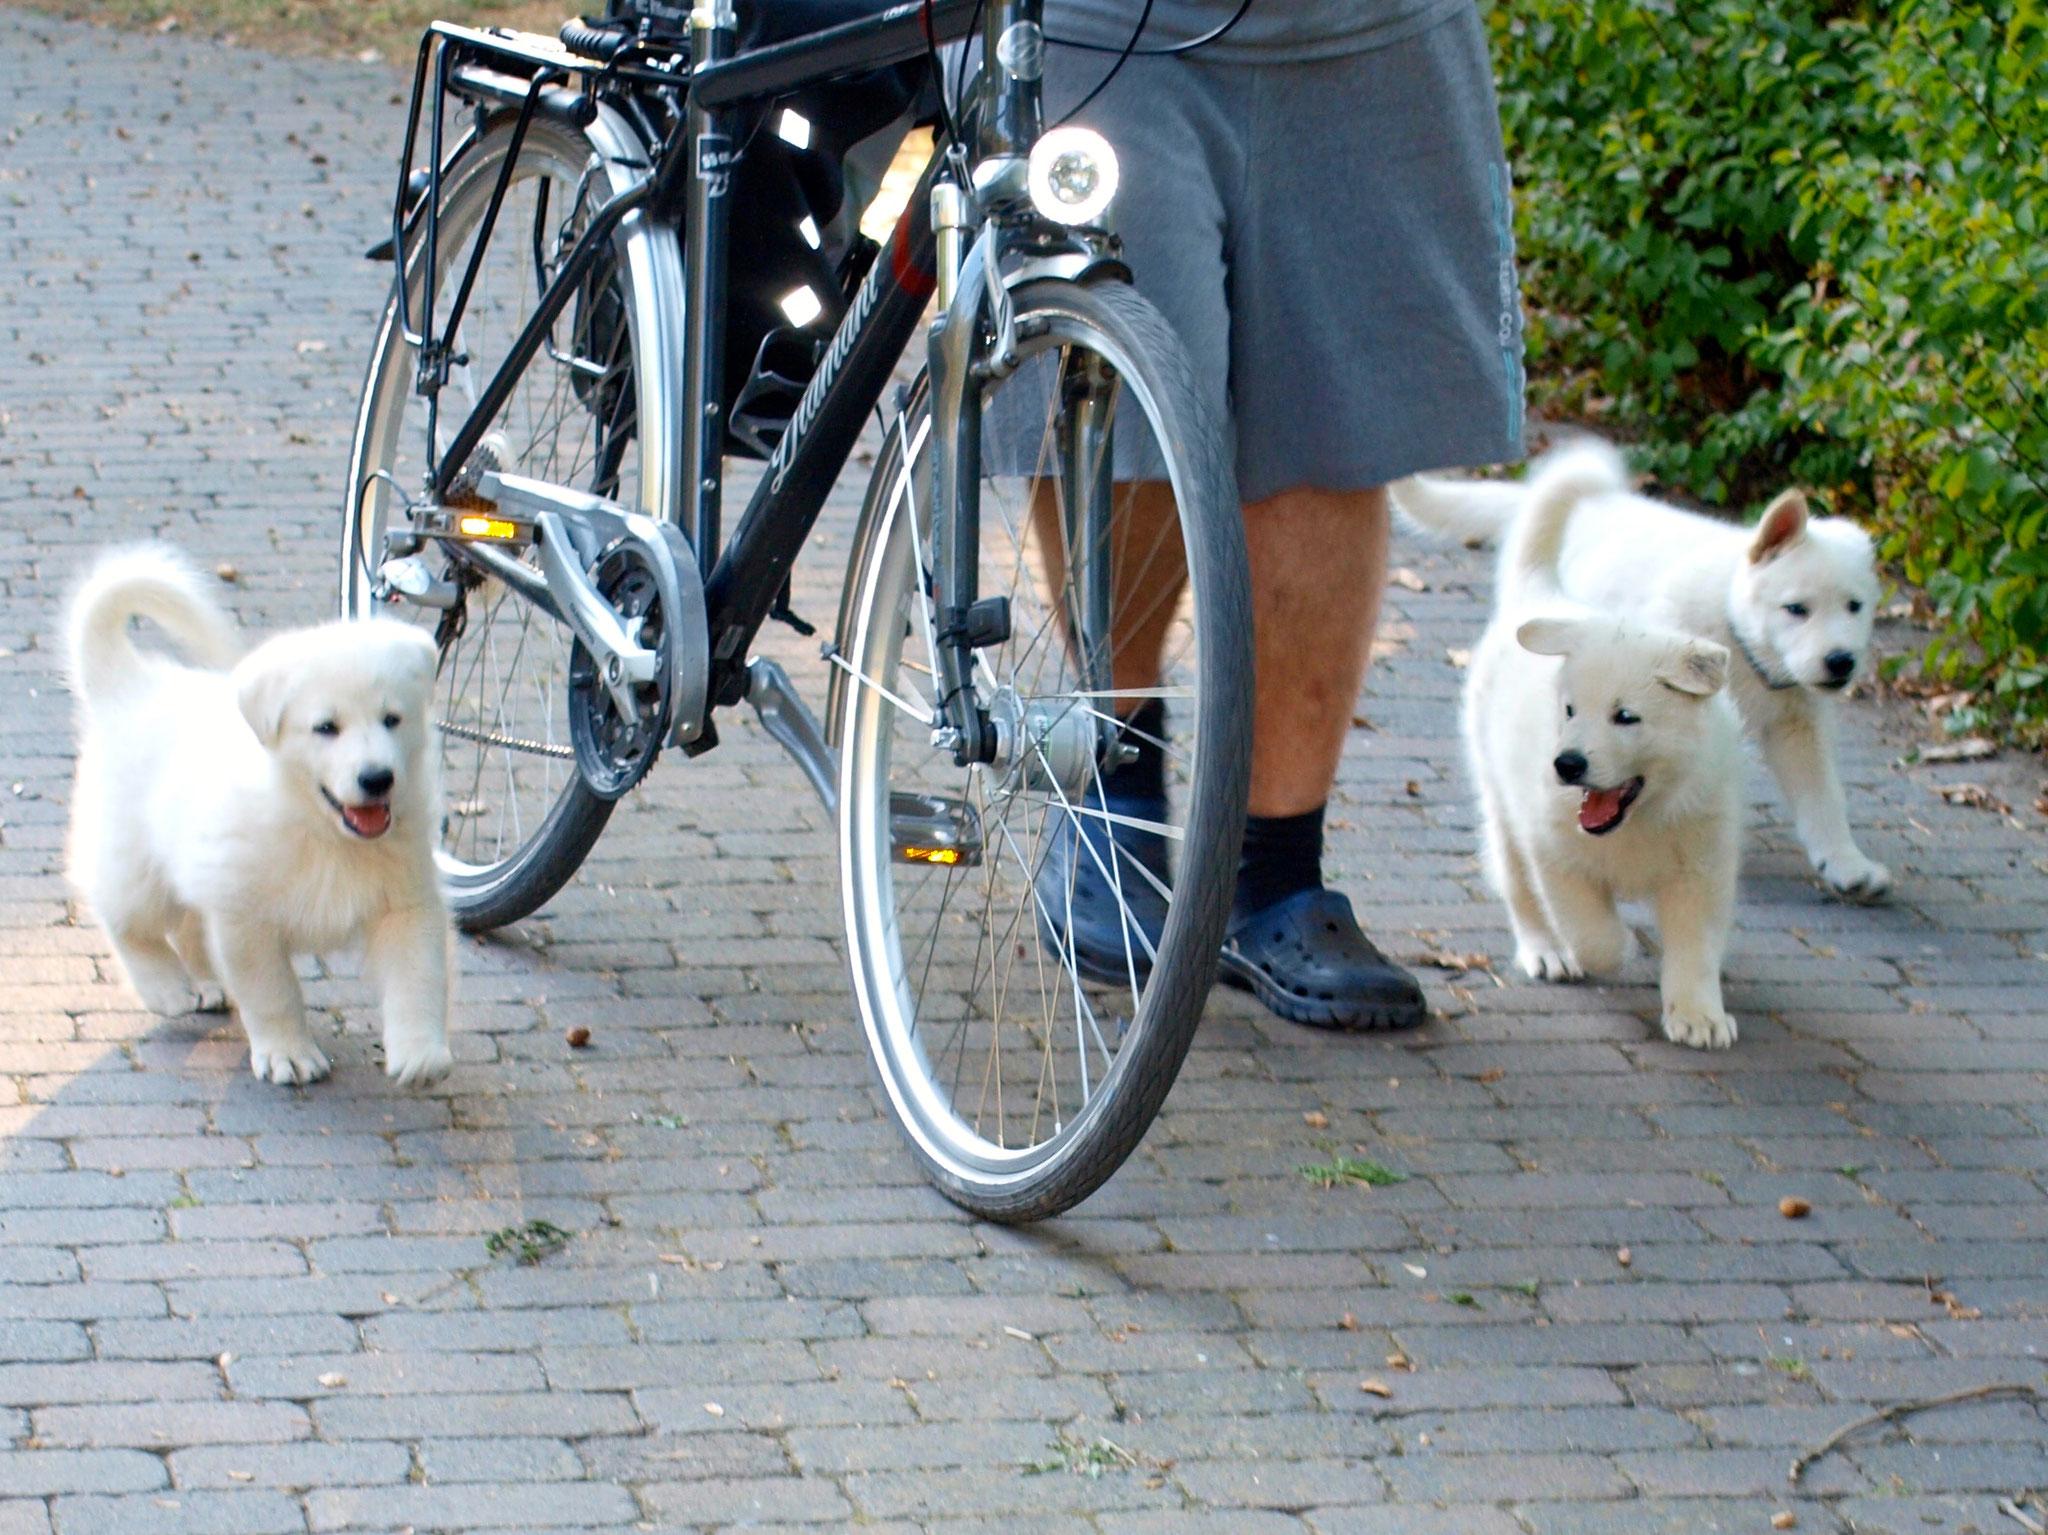 perfekte Fahrrad-Begleit-Hunde